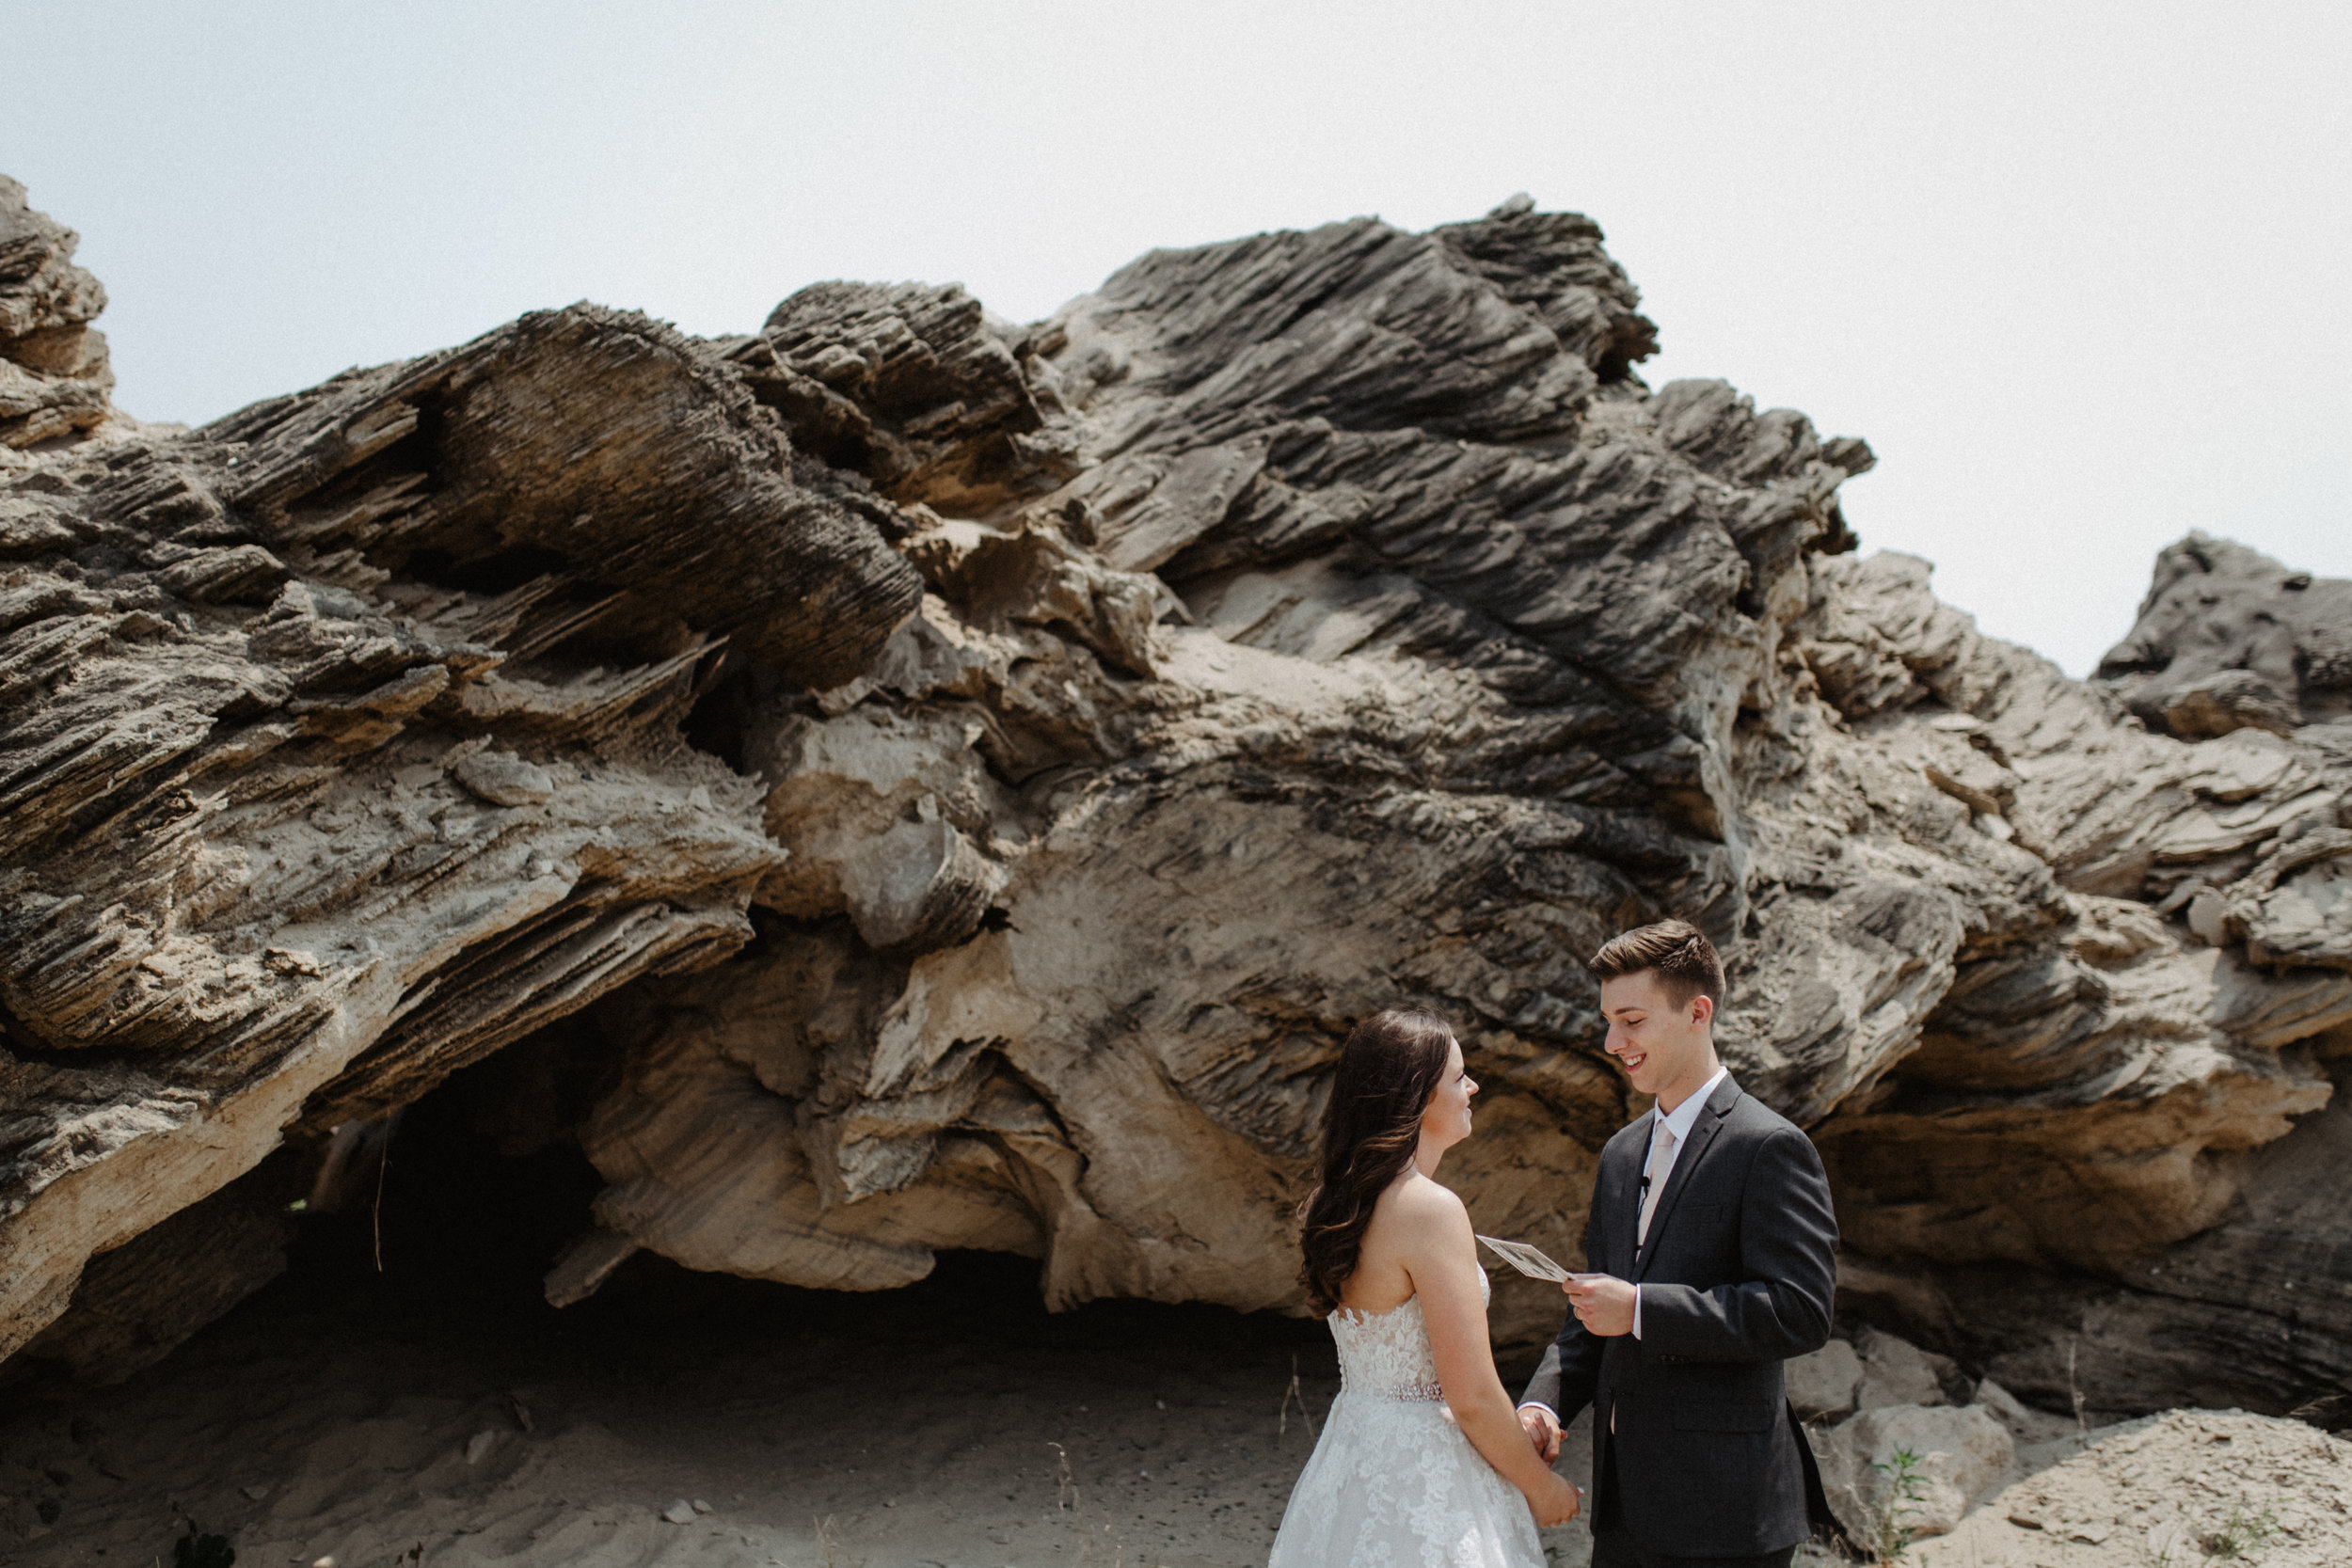 GRAYCENTOMHAMILTON-GRAND-RAPIDS-WEDDING-PHOTOGRAPHY-20.jpg